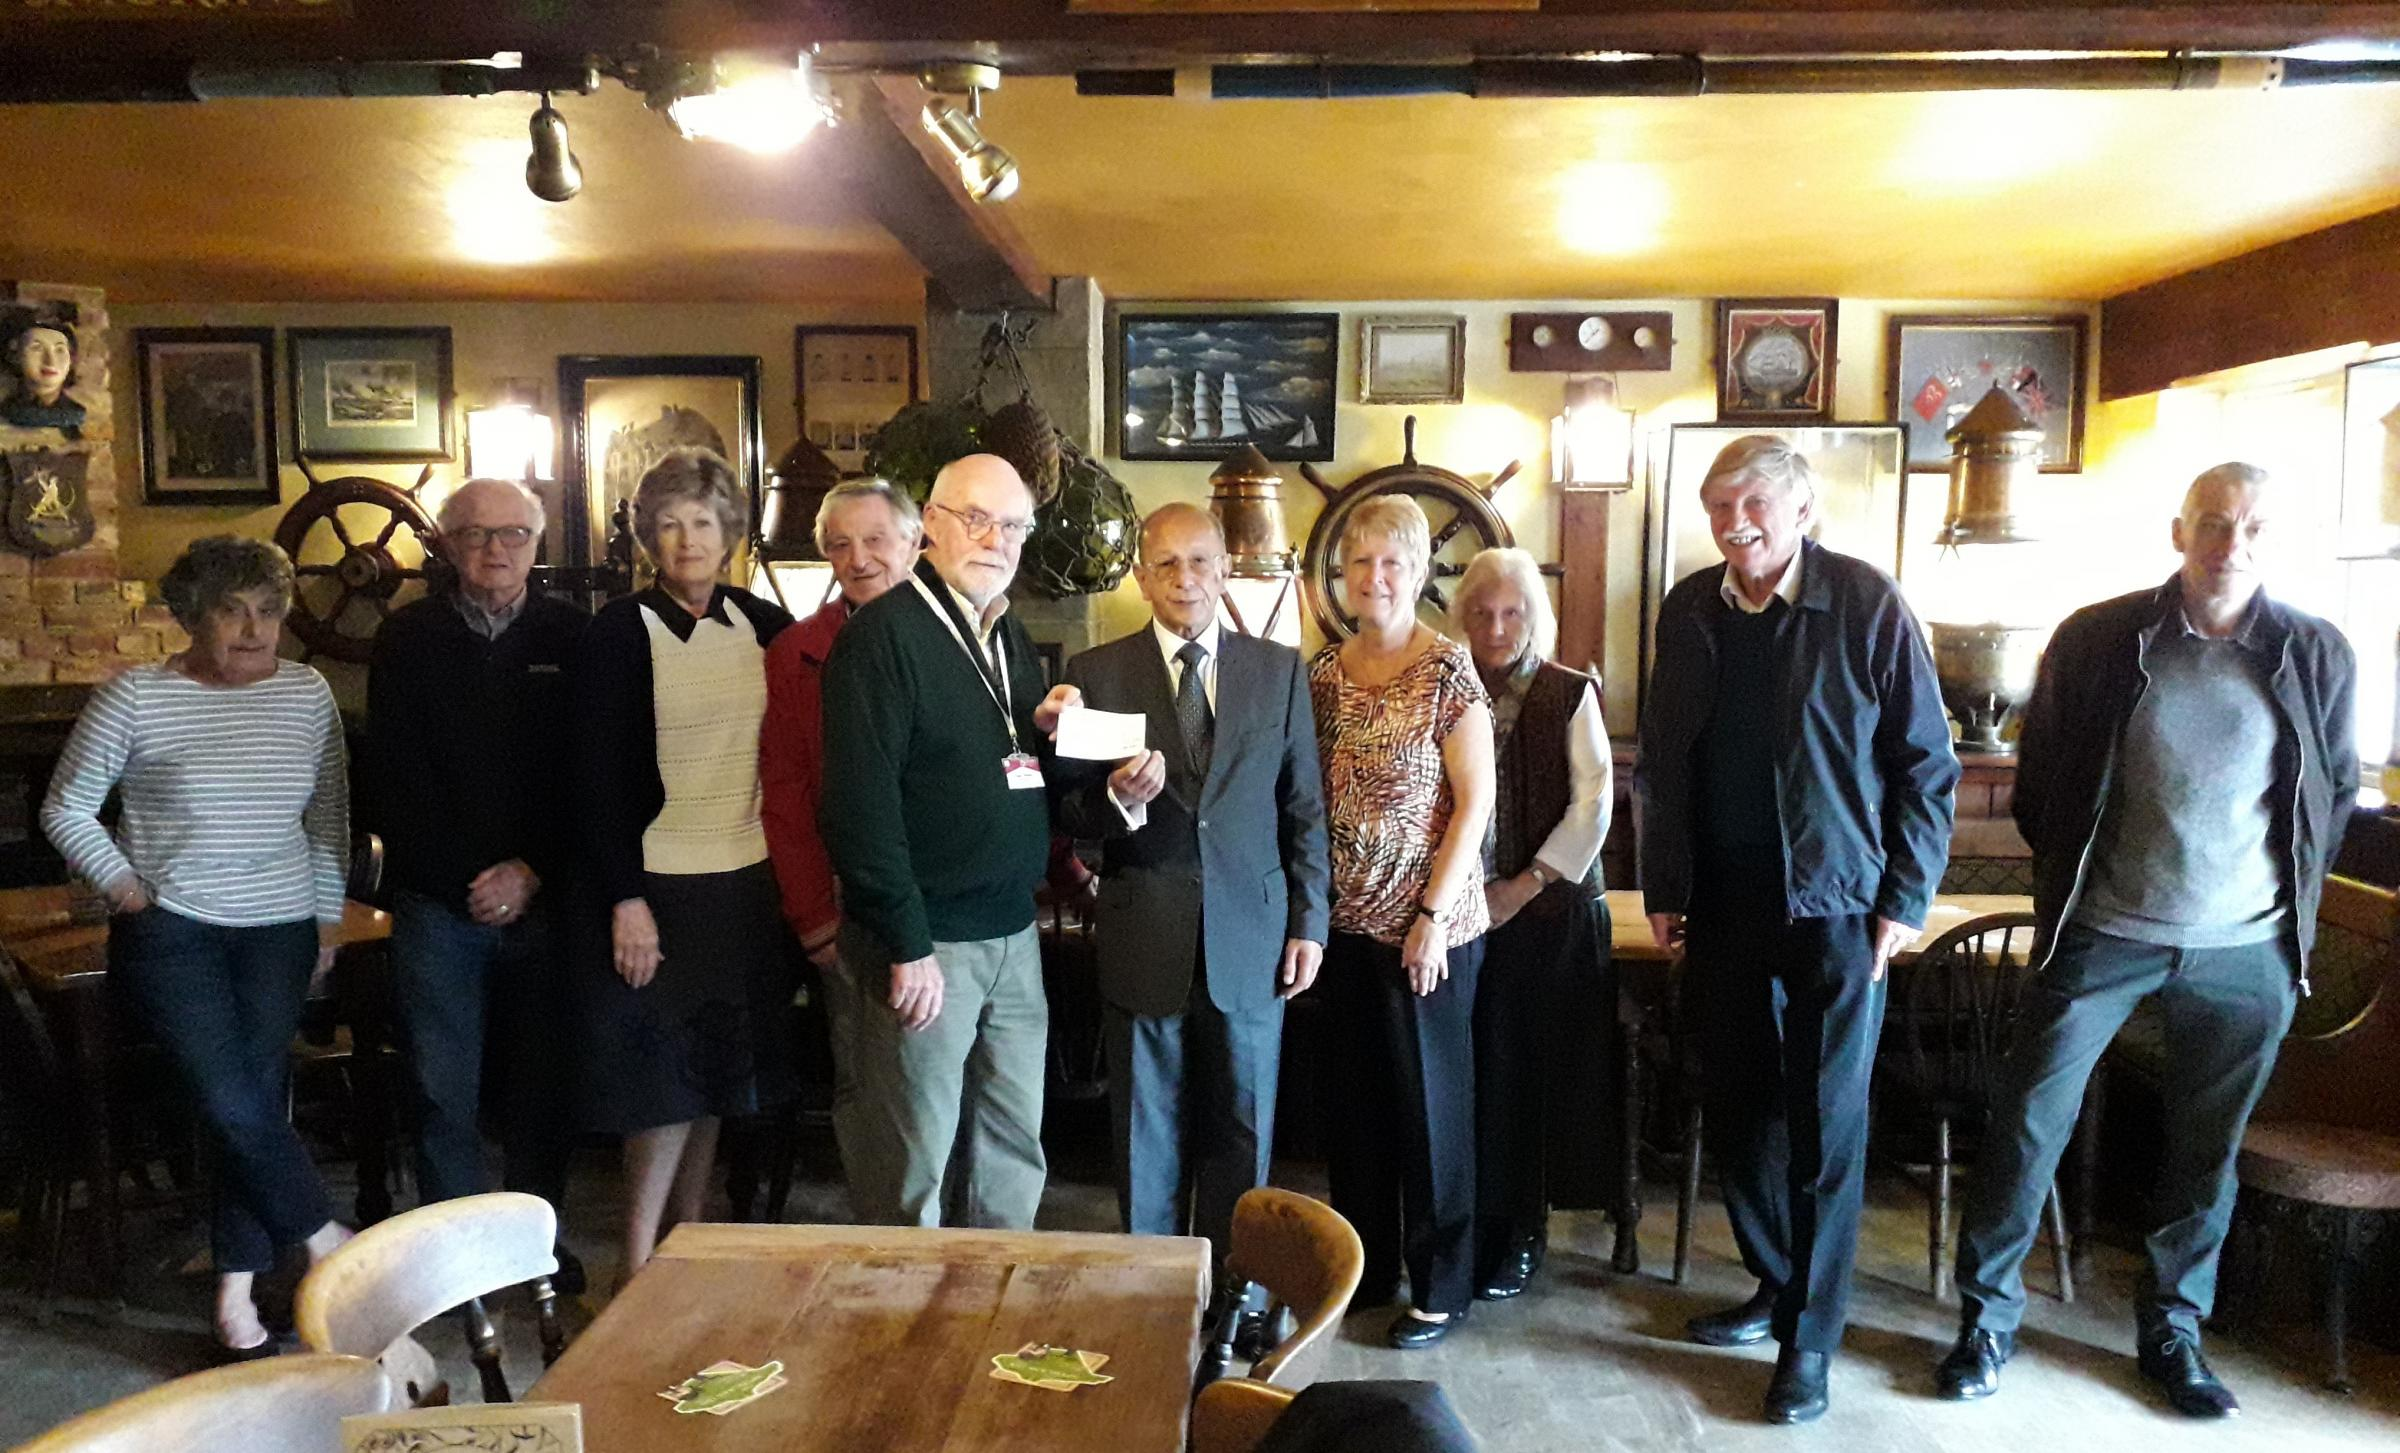 Osborne Lodge freemasons make £300 donation to Isle of Wight support group